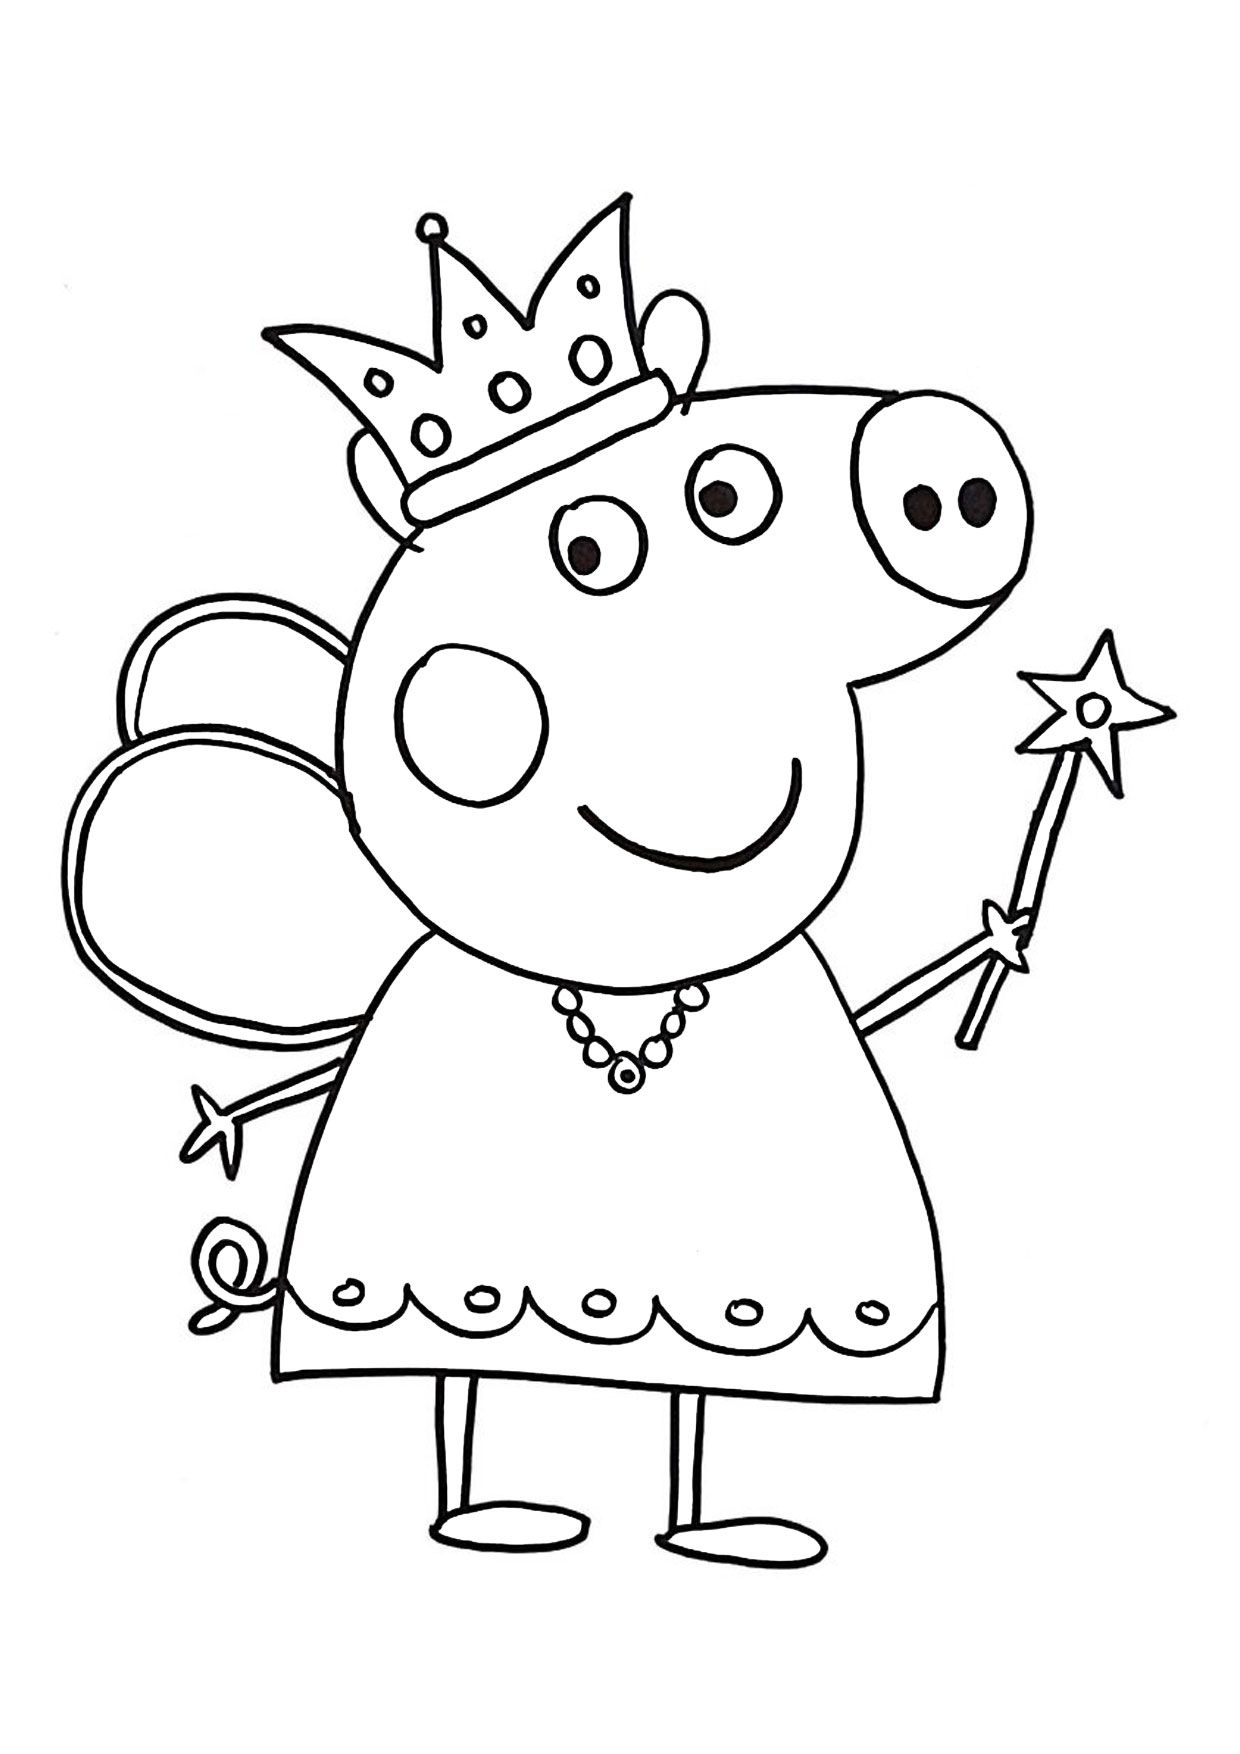 54 Disegni Di Peppa Pig Da Colorare Disegni Da Colorare Disegni Disegni Da Colorare Per Bambini